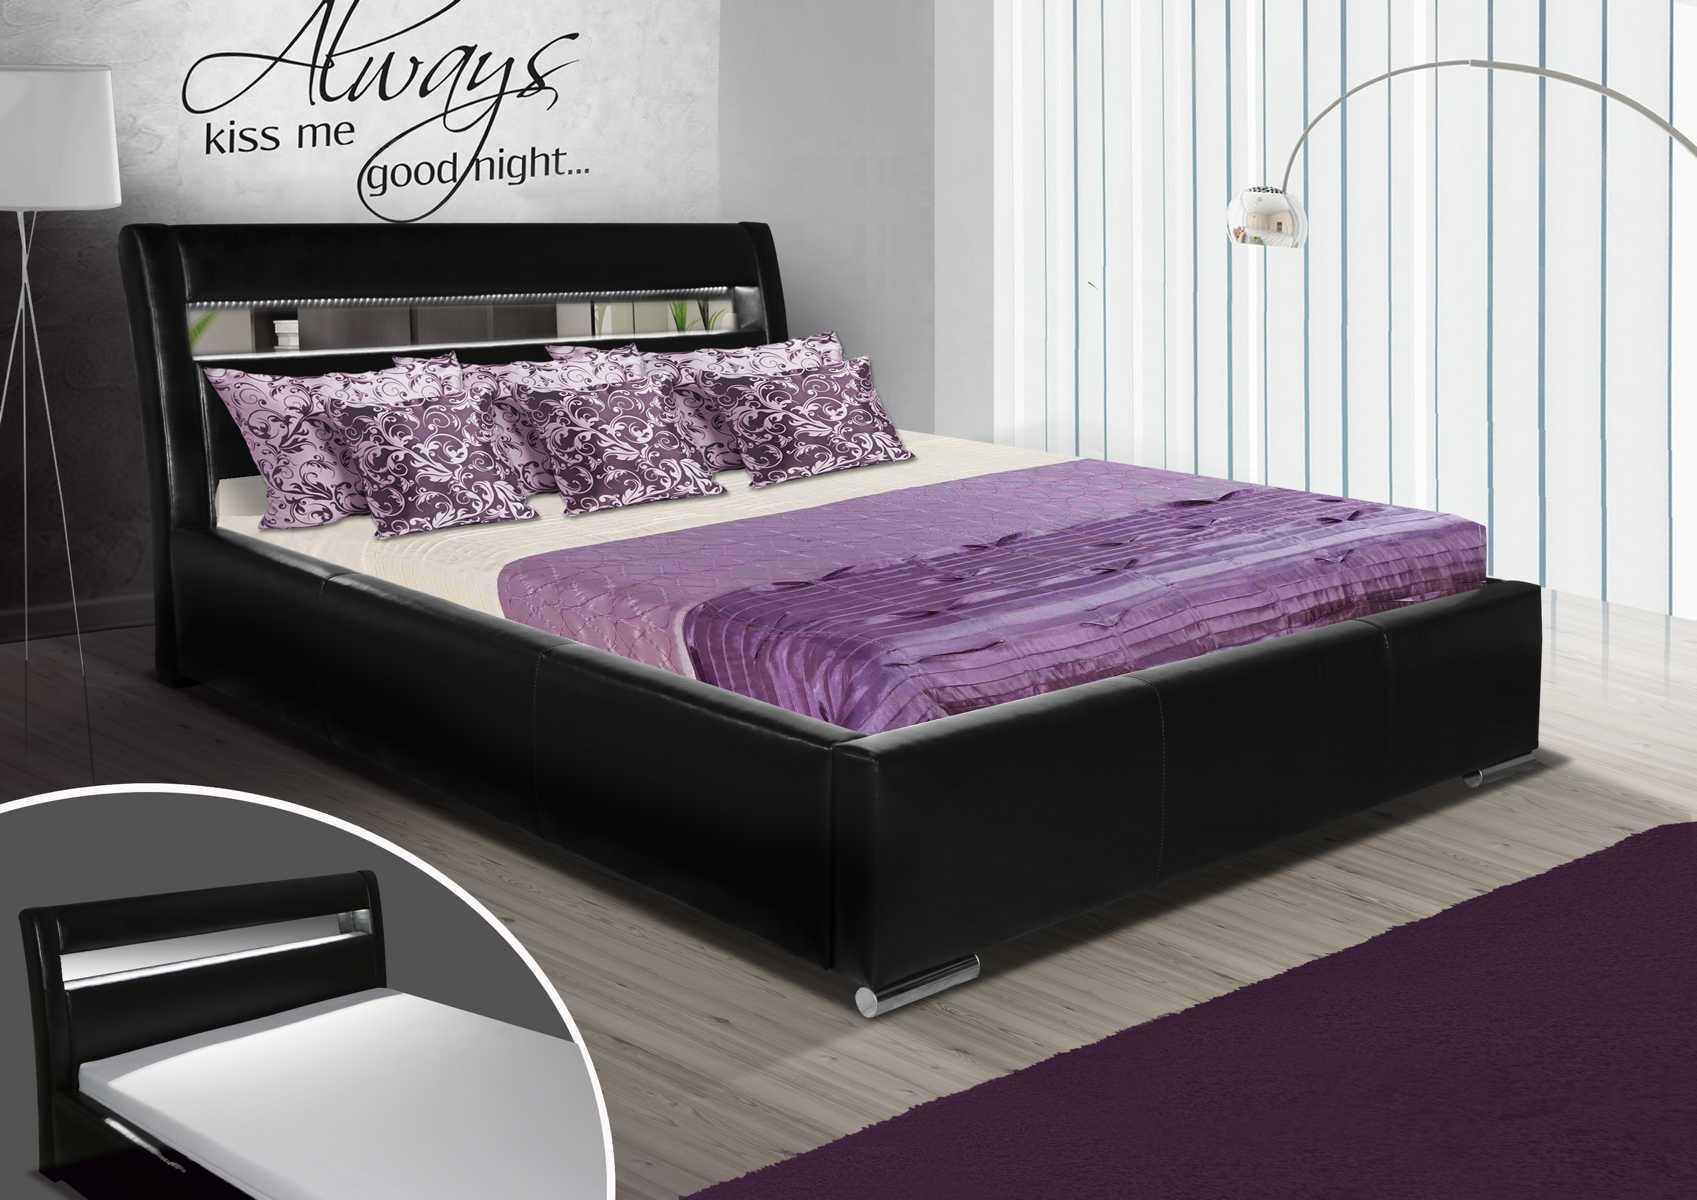 design betten in hochwertiger qualit t oder rundbett max 1 bei jv m bel. Black Bedroom Furniture Sets. Home Design Ideas